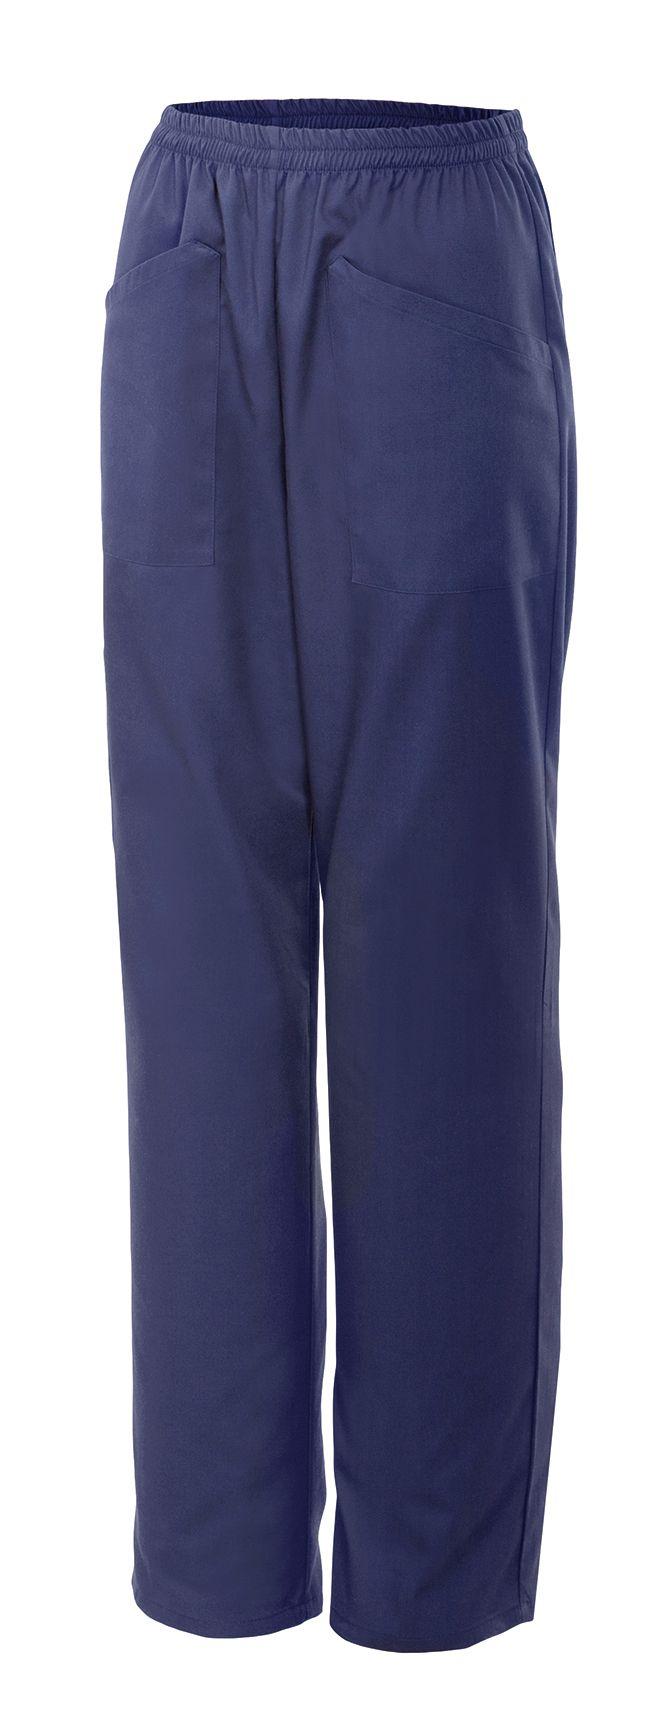 319 Pantalón pijama mujer: Catálogo de Mòn Laboral